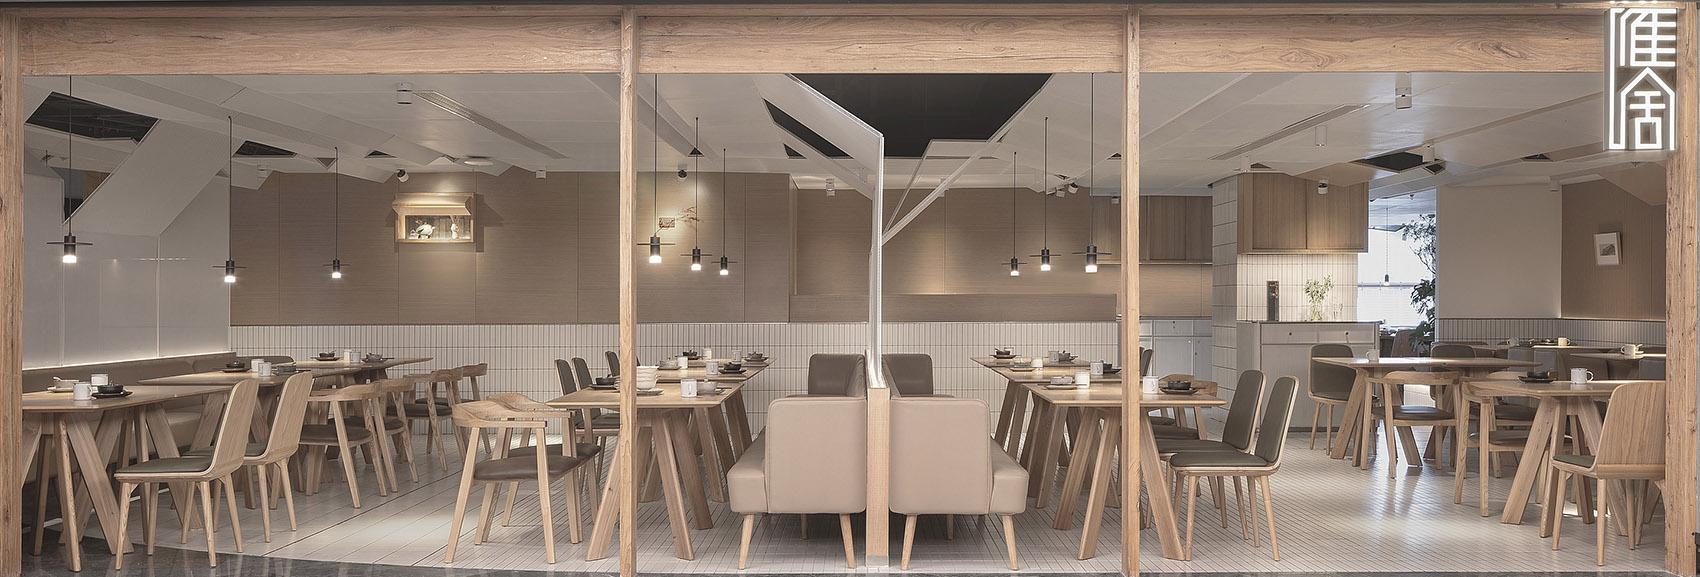 023-goose-hut-home-bistro-china-by-golucci-interior-architects.jpg